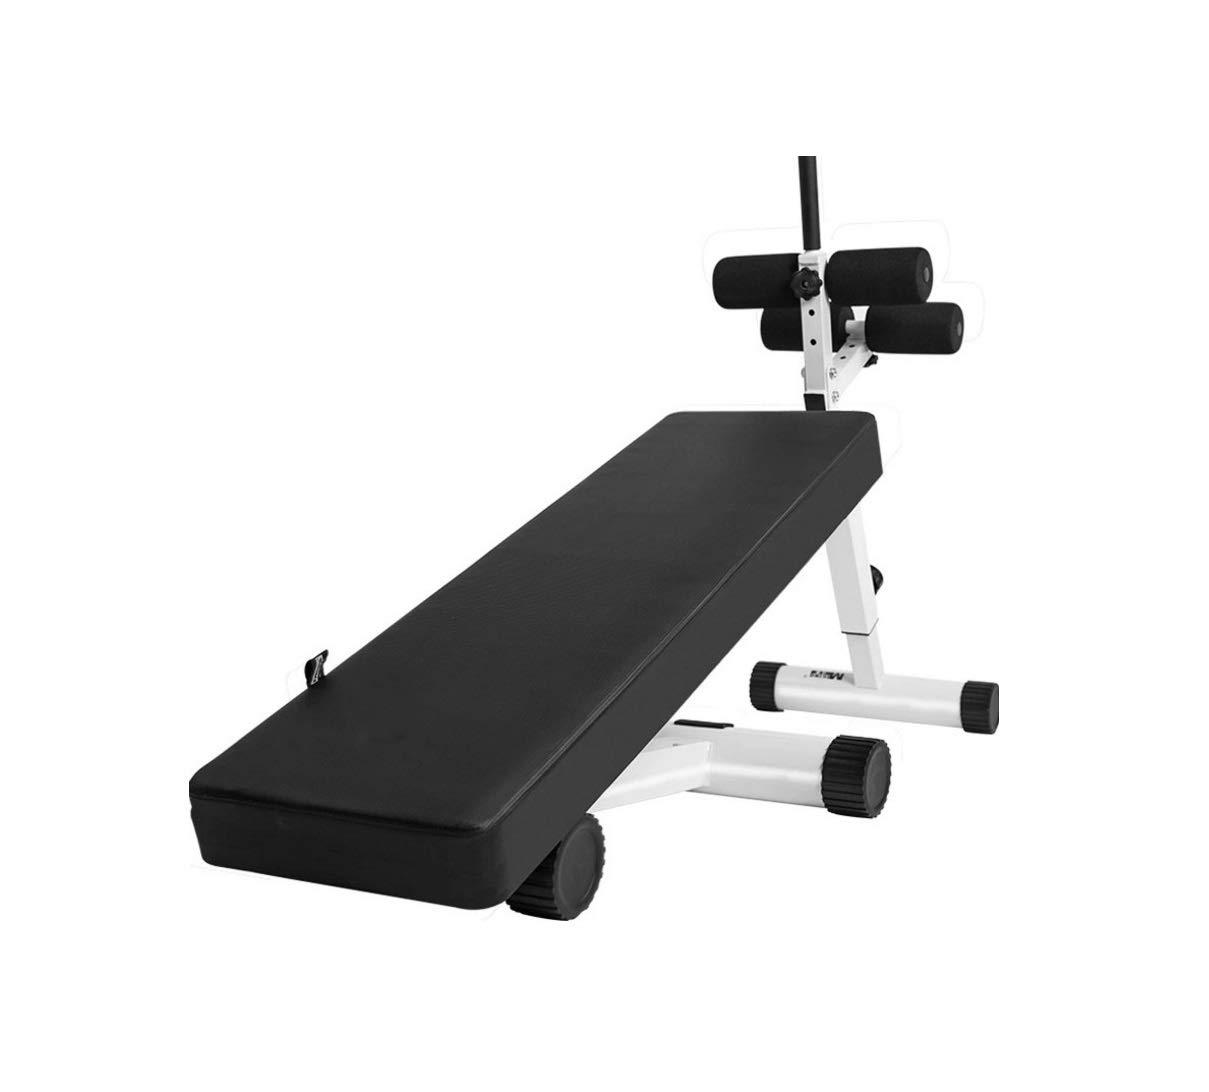 ShiMin 腹筋ボード室内腹部ボード多機能フィットネスボードフィットネス機器家庭用腹筋トレーニング器具 ShiMin   B07QTPQYLZ